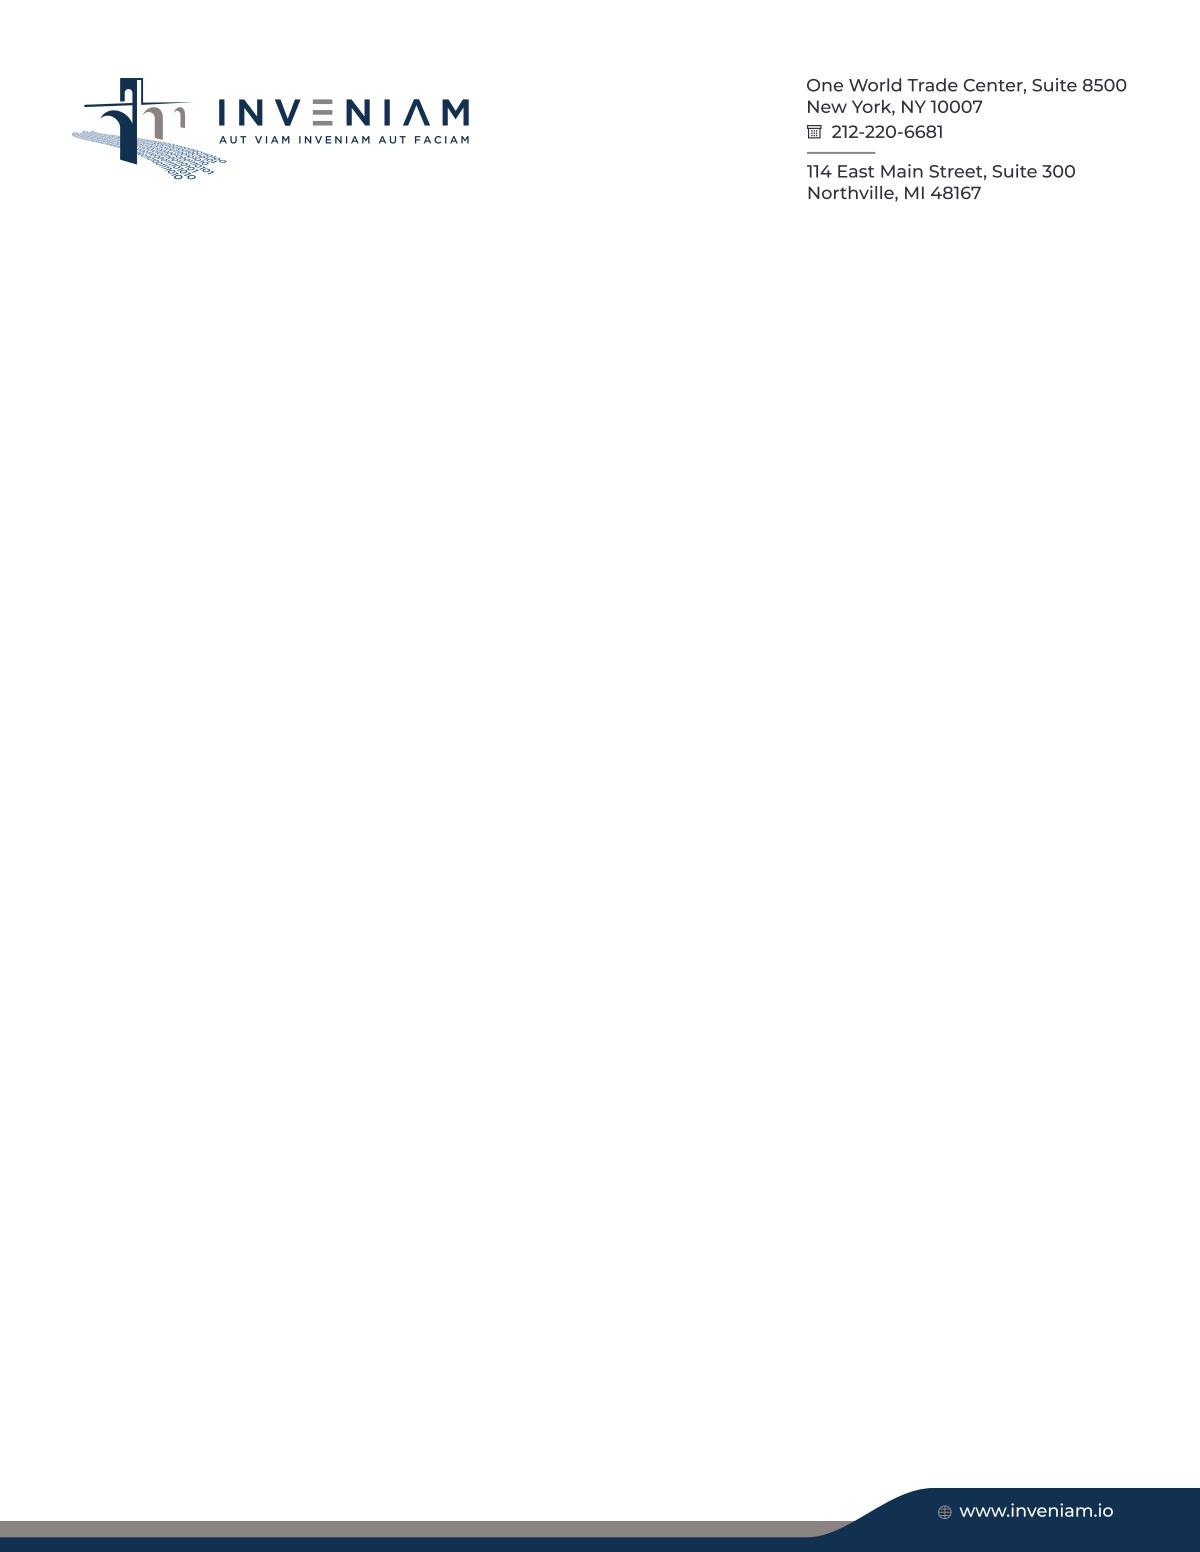 Inveniam - letterhead and business card